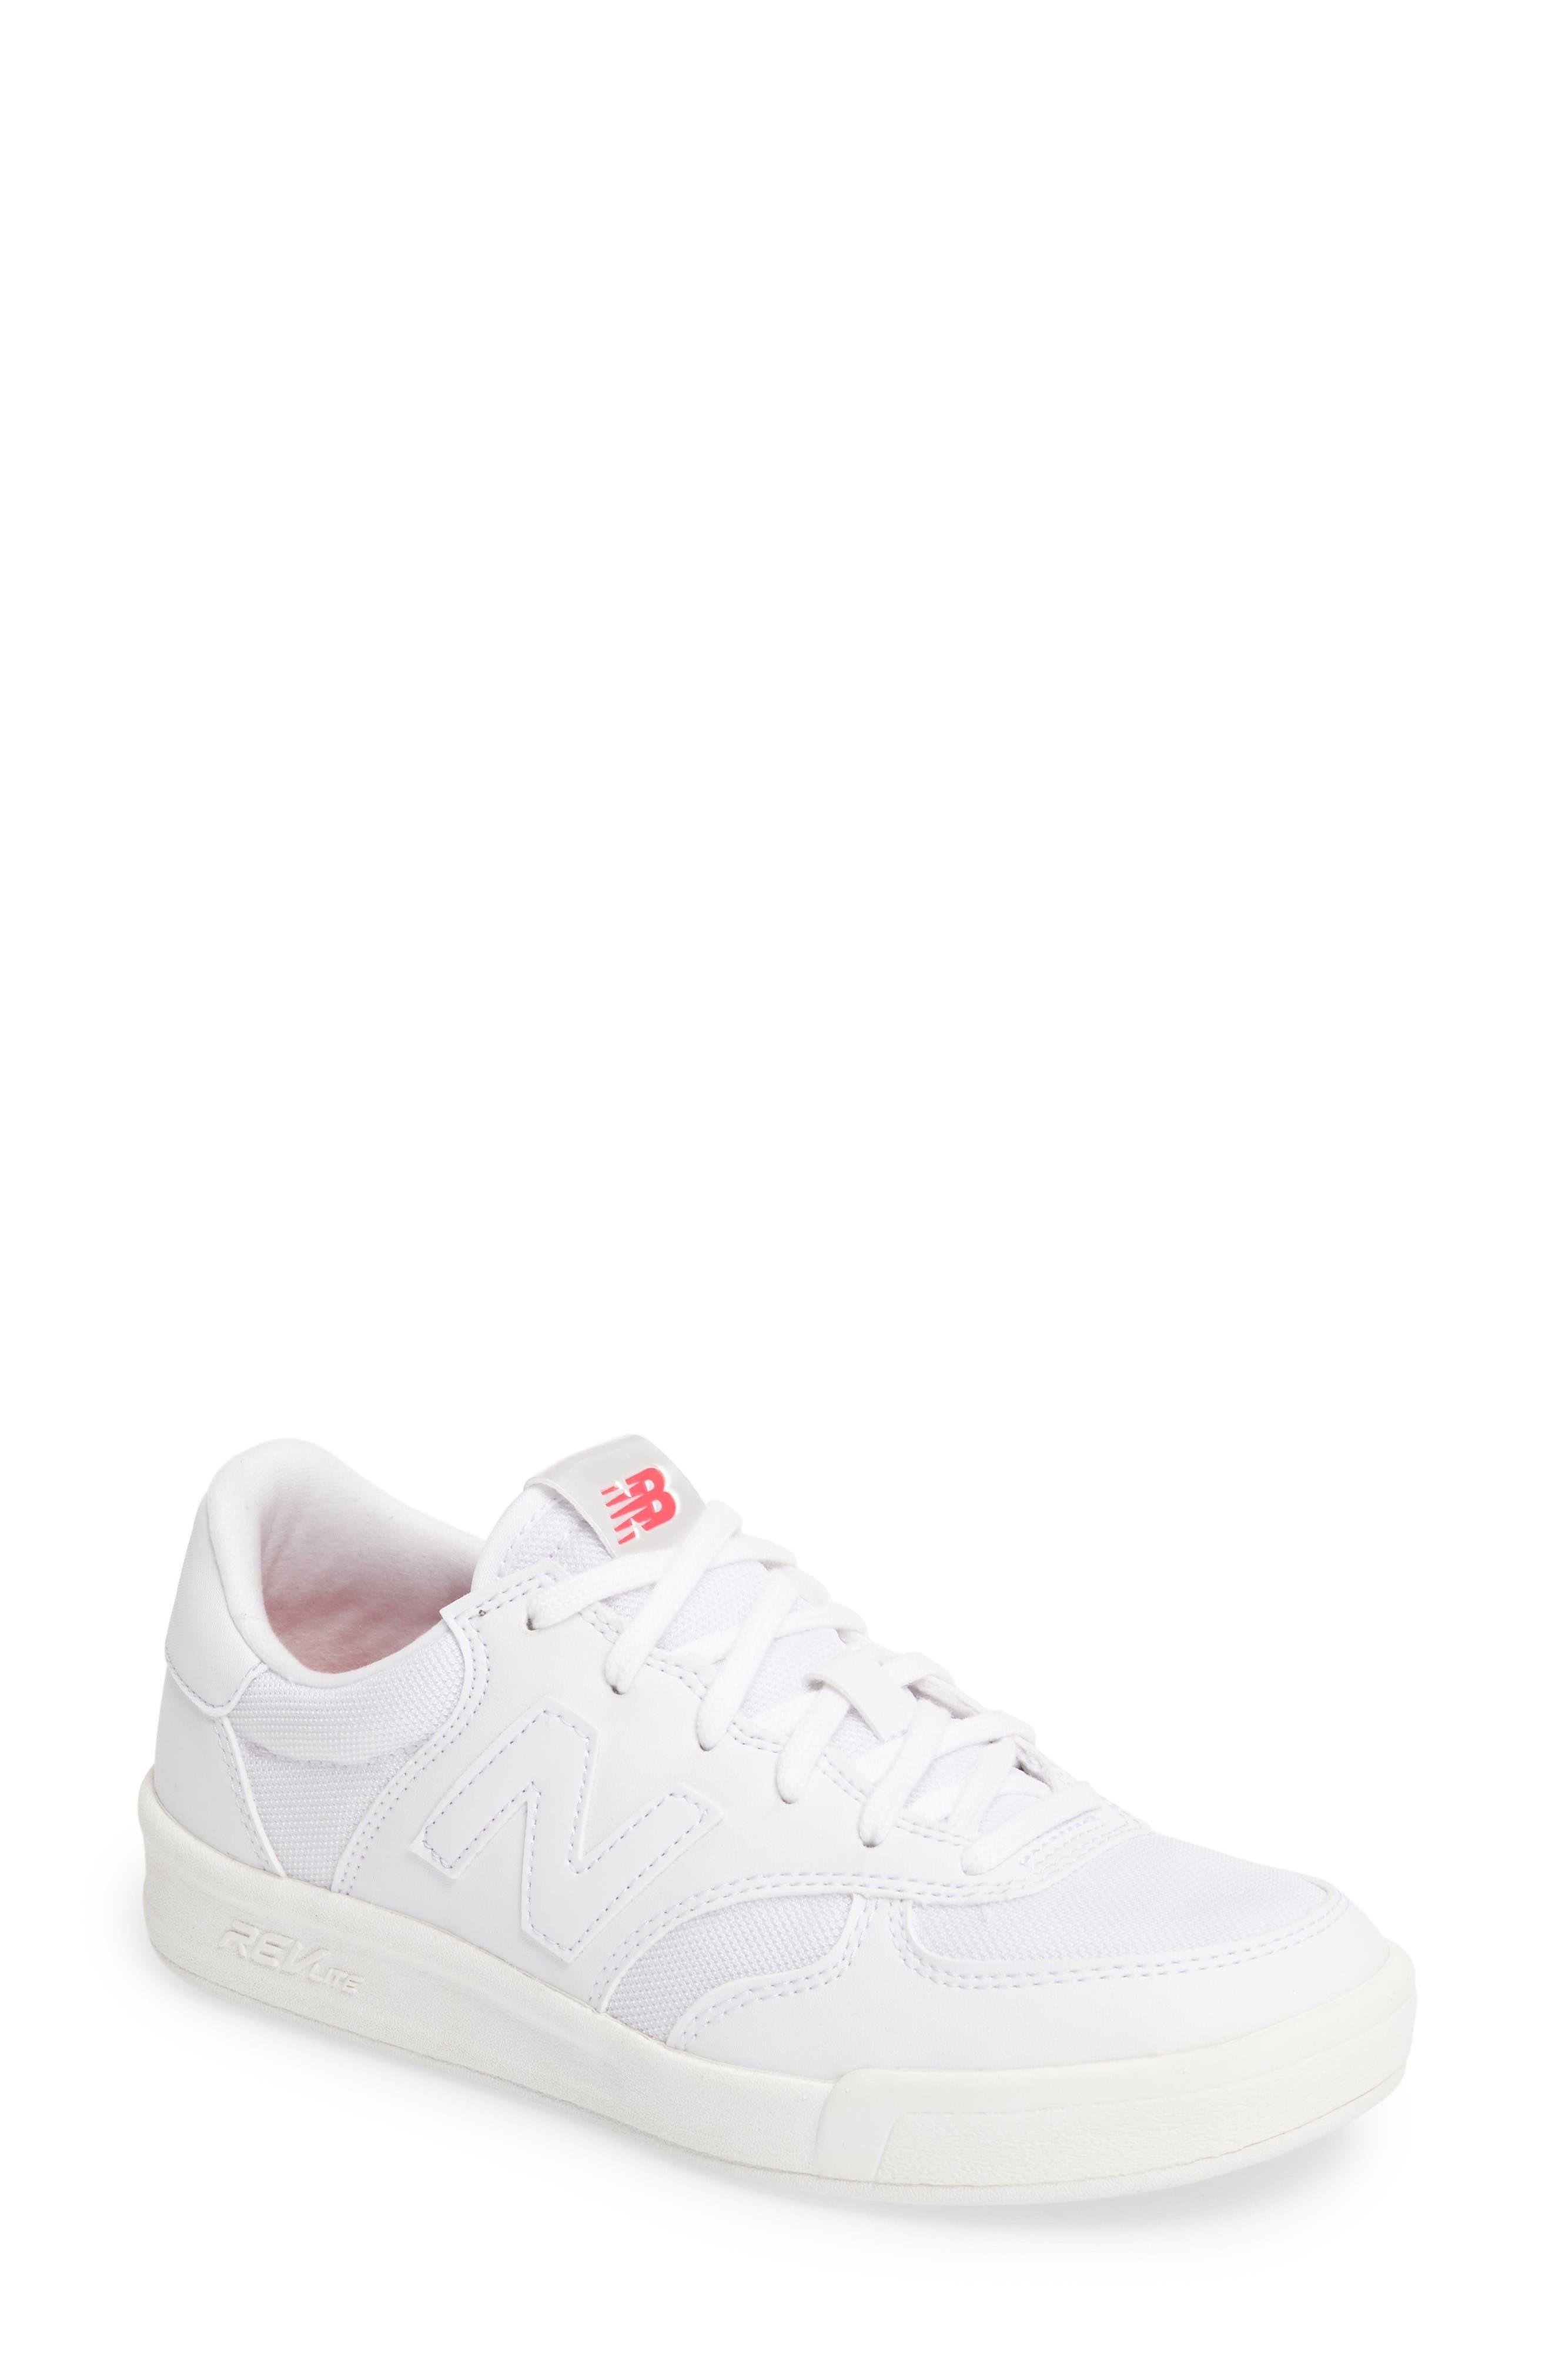 Main Image - New Balance Sport Style 300 Sneaker (Women)